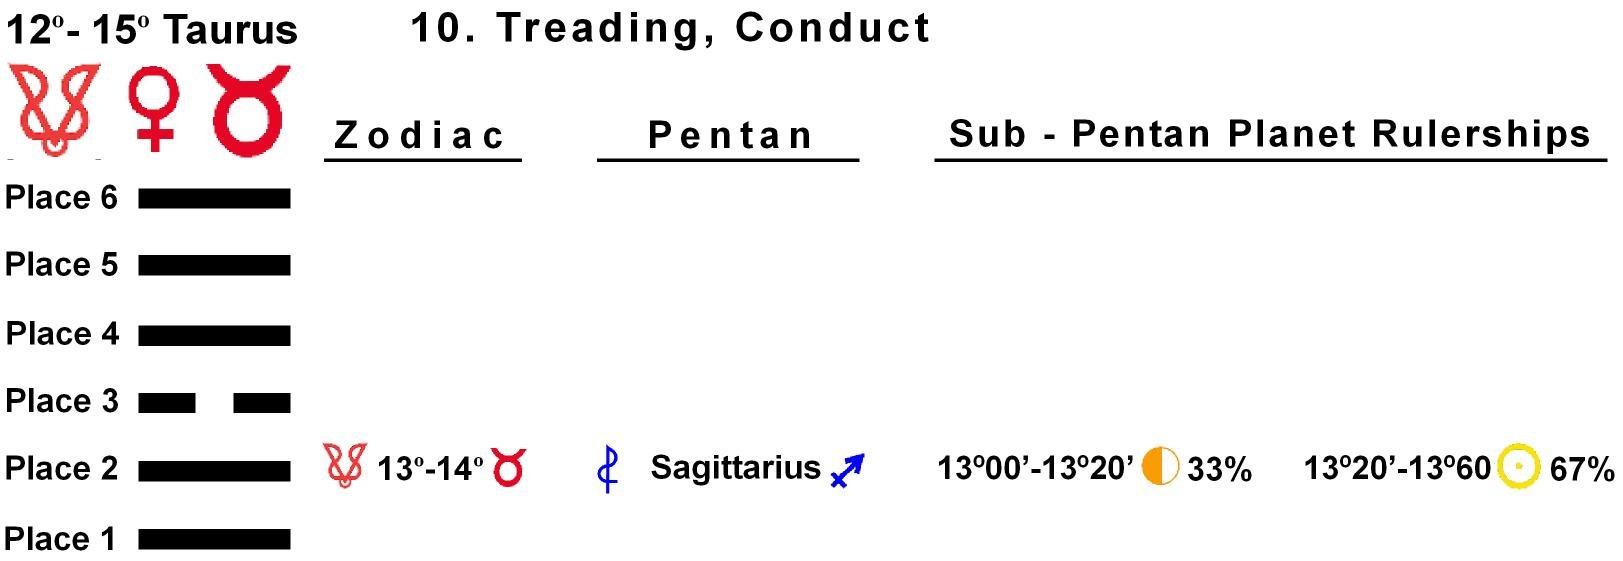 Pent-lines-02TA 13-14 Hx-10 Treading Conduct